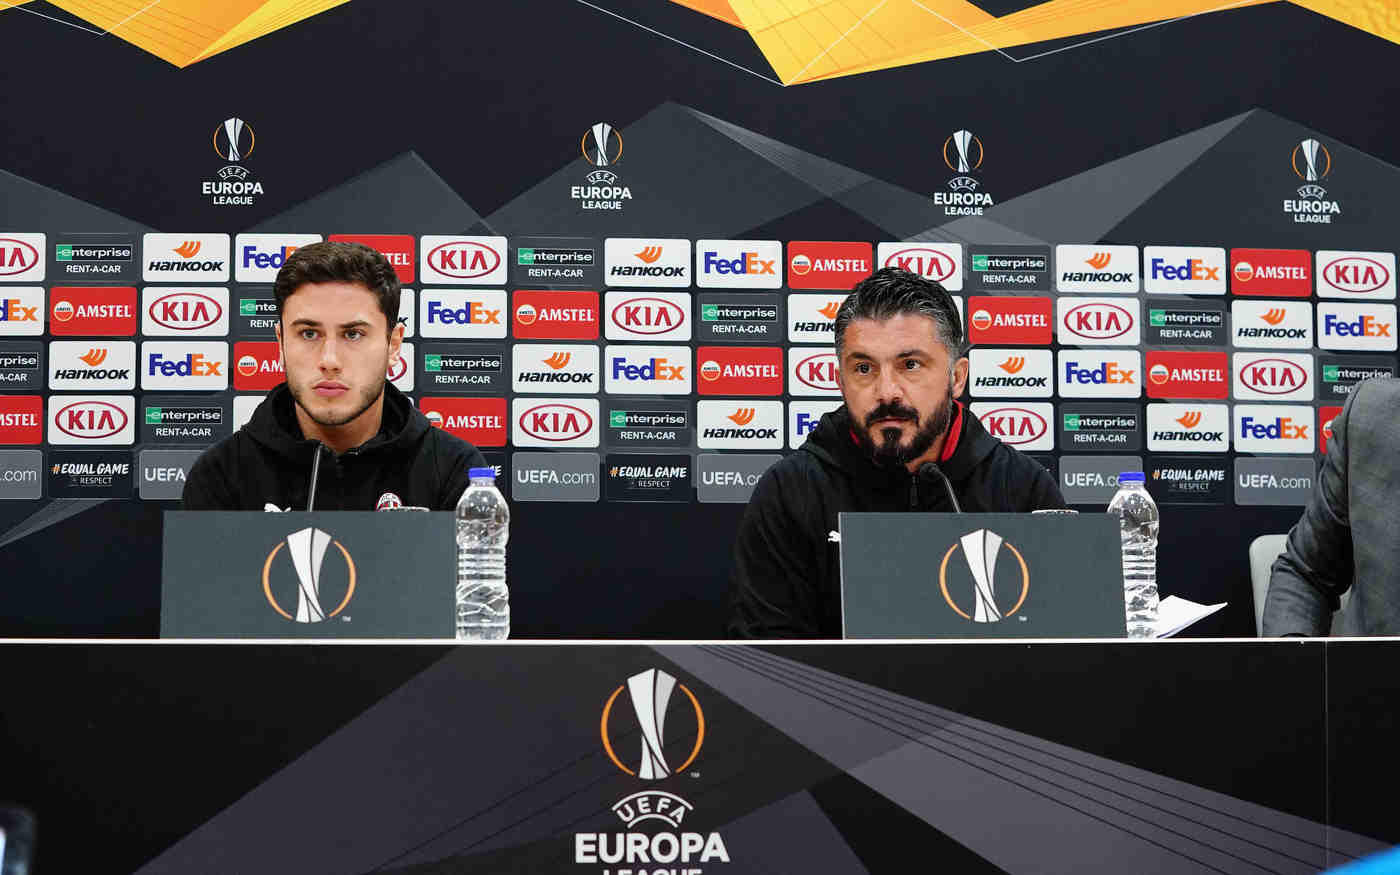 Europa League, la vigilia del Milan